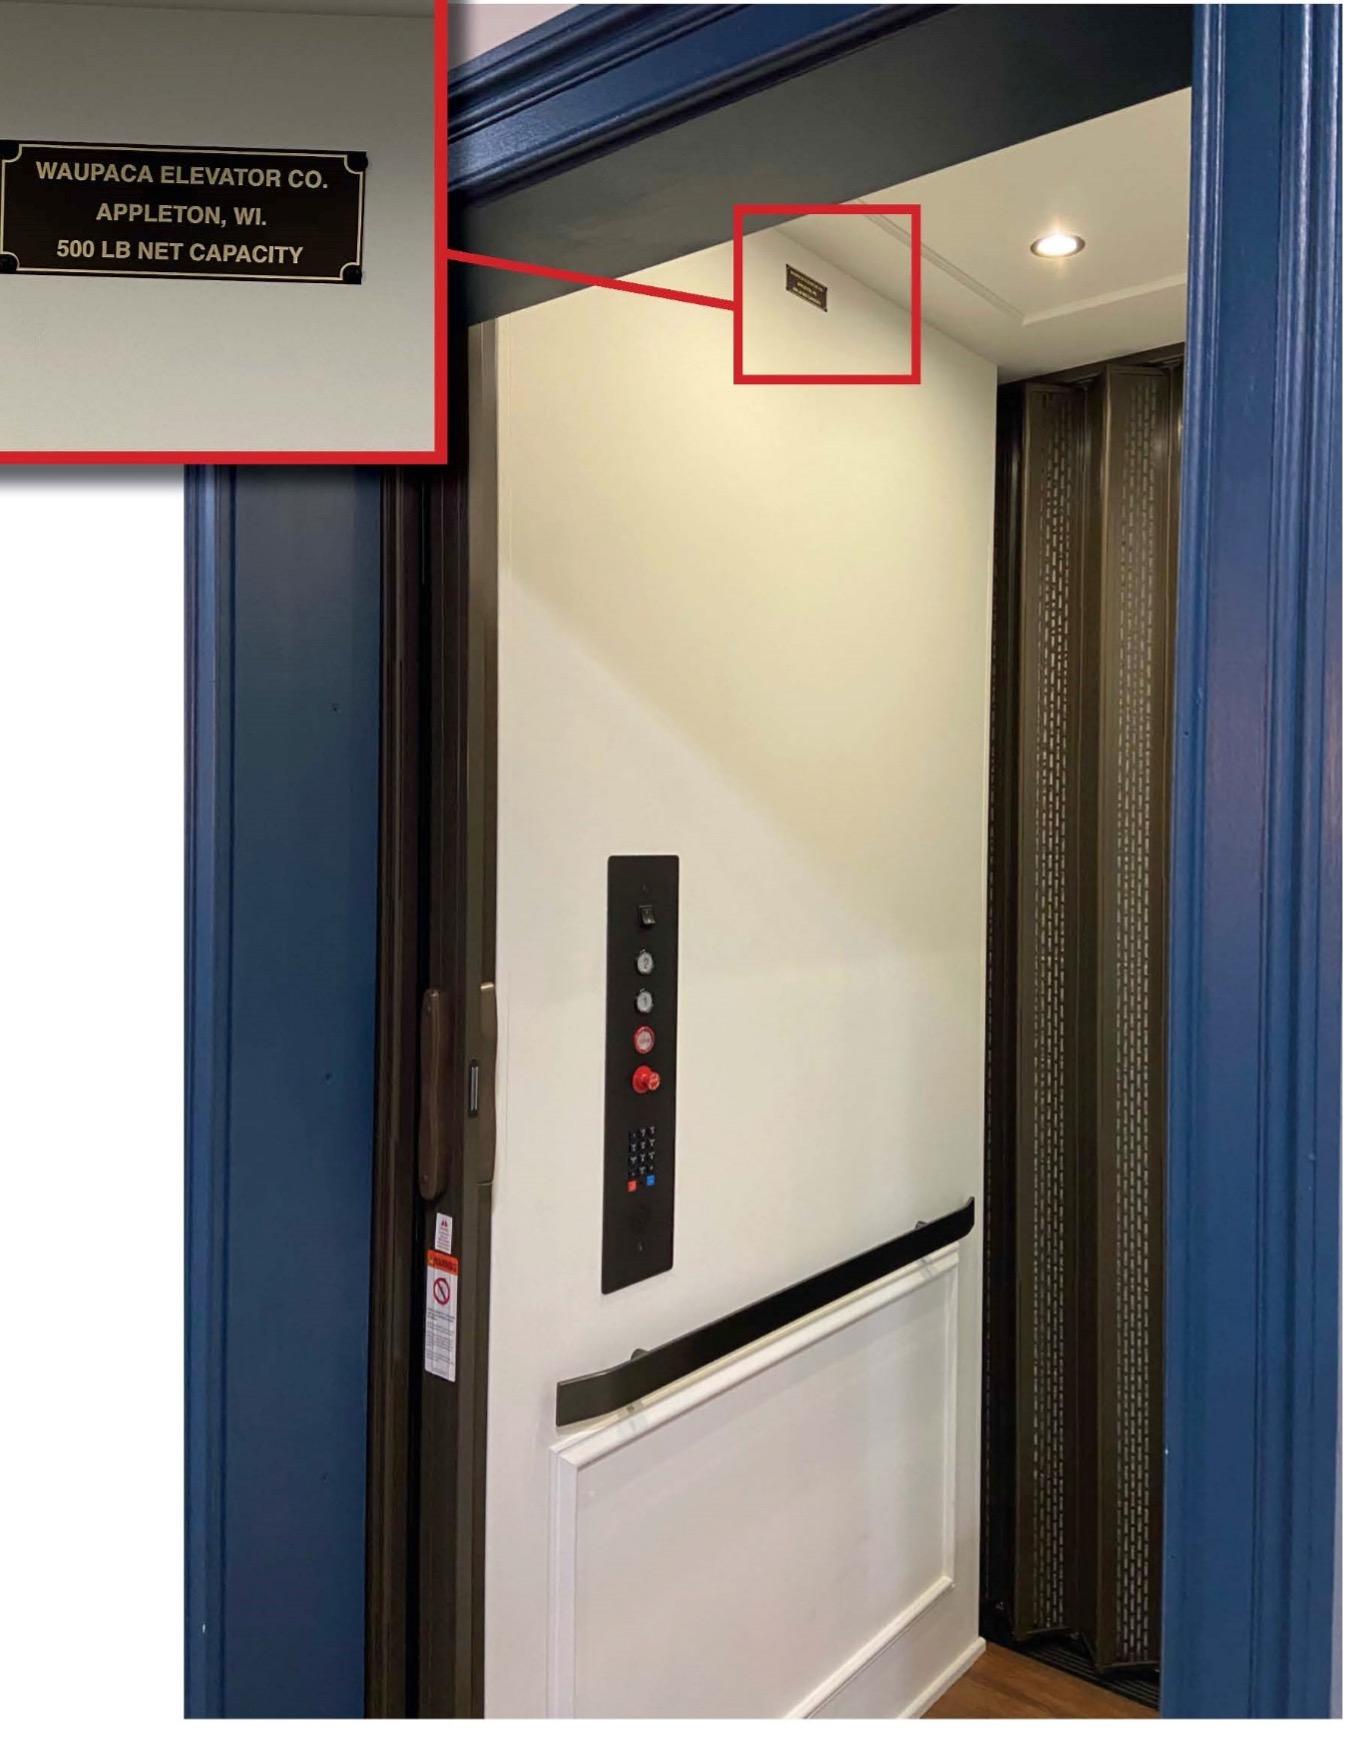 Recalled Waupaca residential elevator, Custom Lift model with label